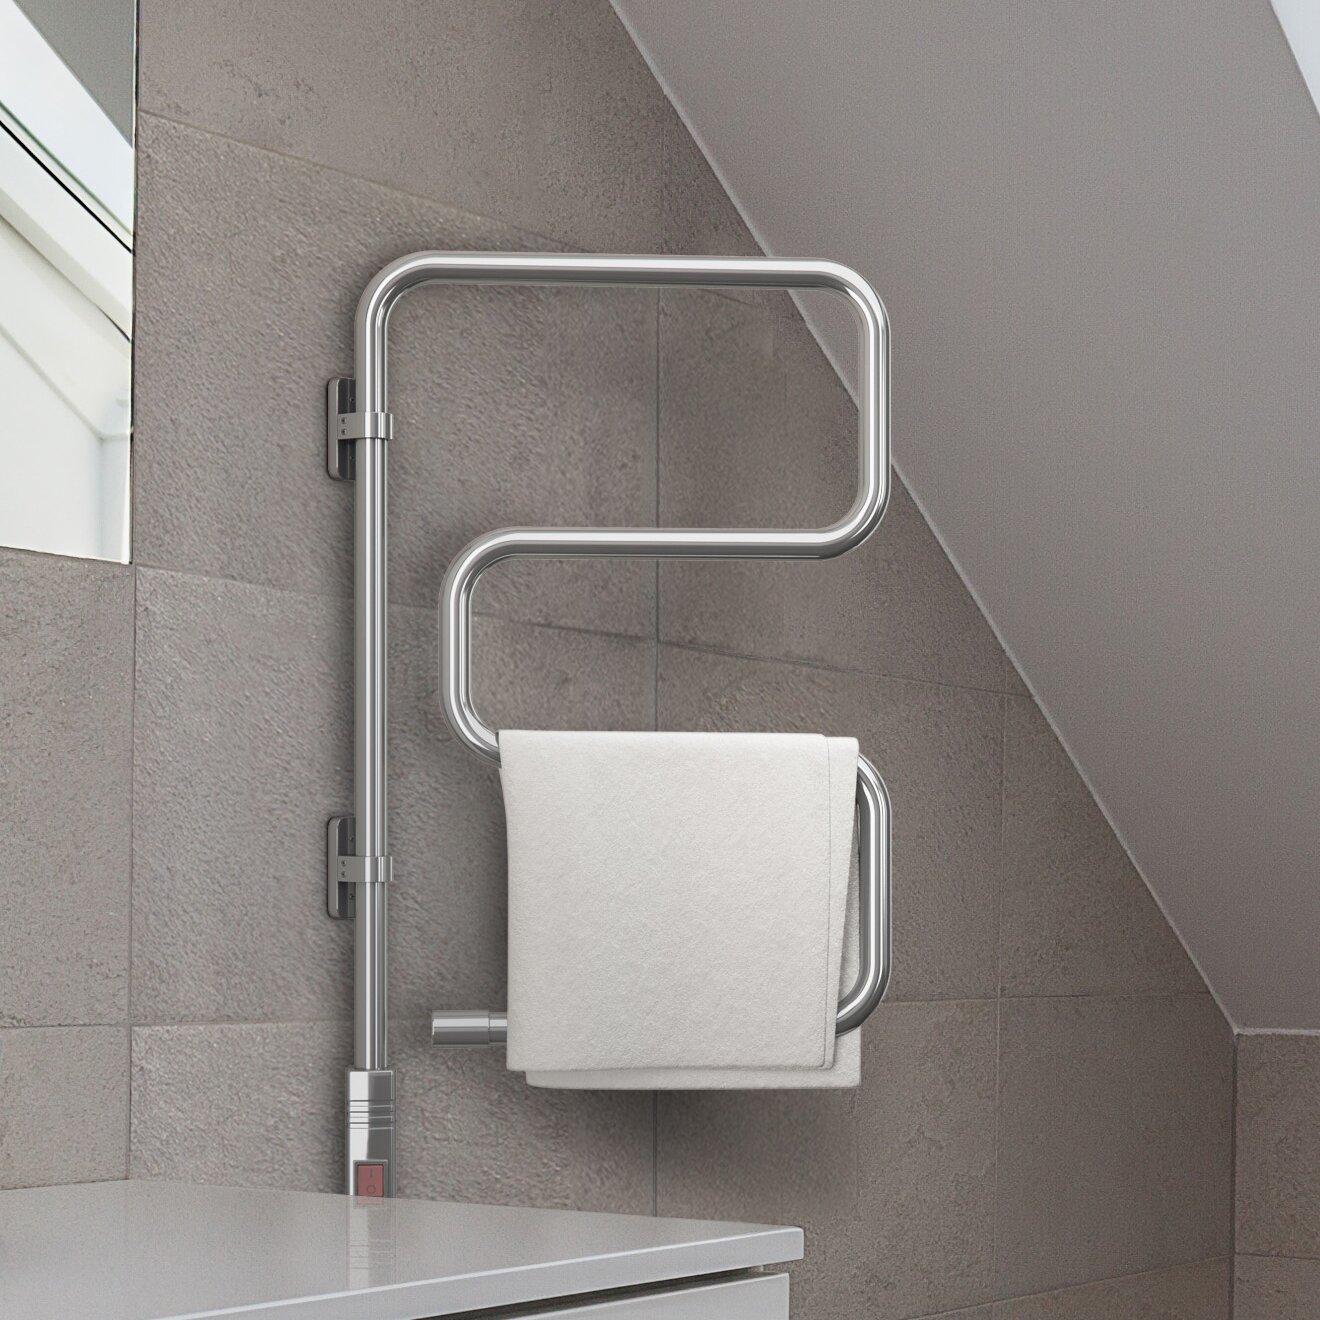 Wall Mounted Electric Towel Warmer ~ Ancona comfort swivel wall mounted electric towel warmer